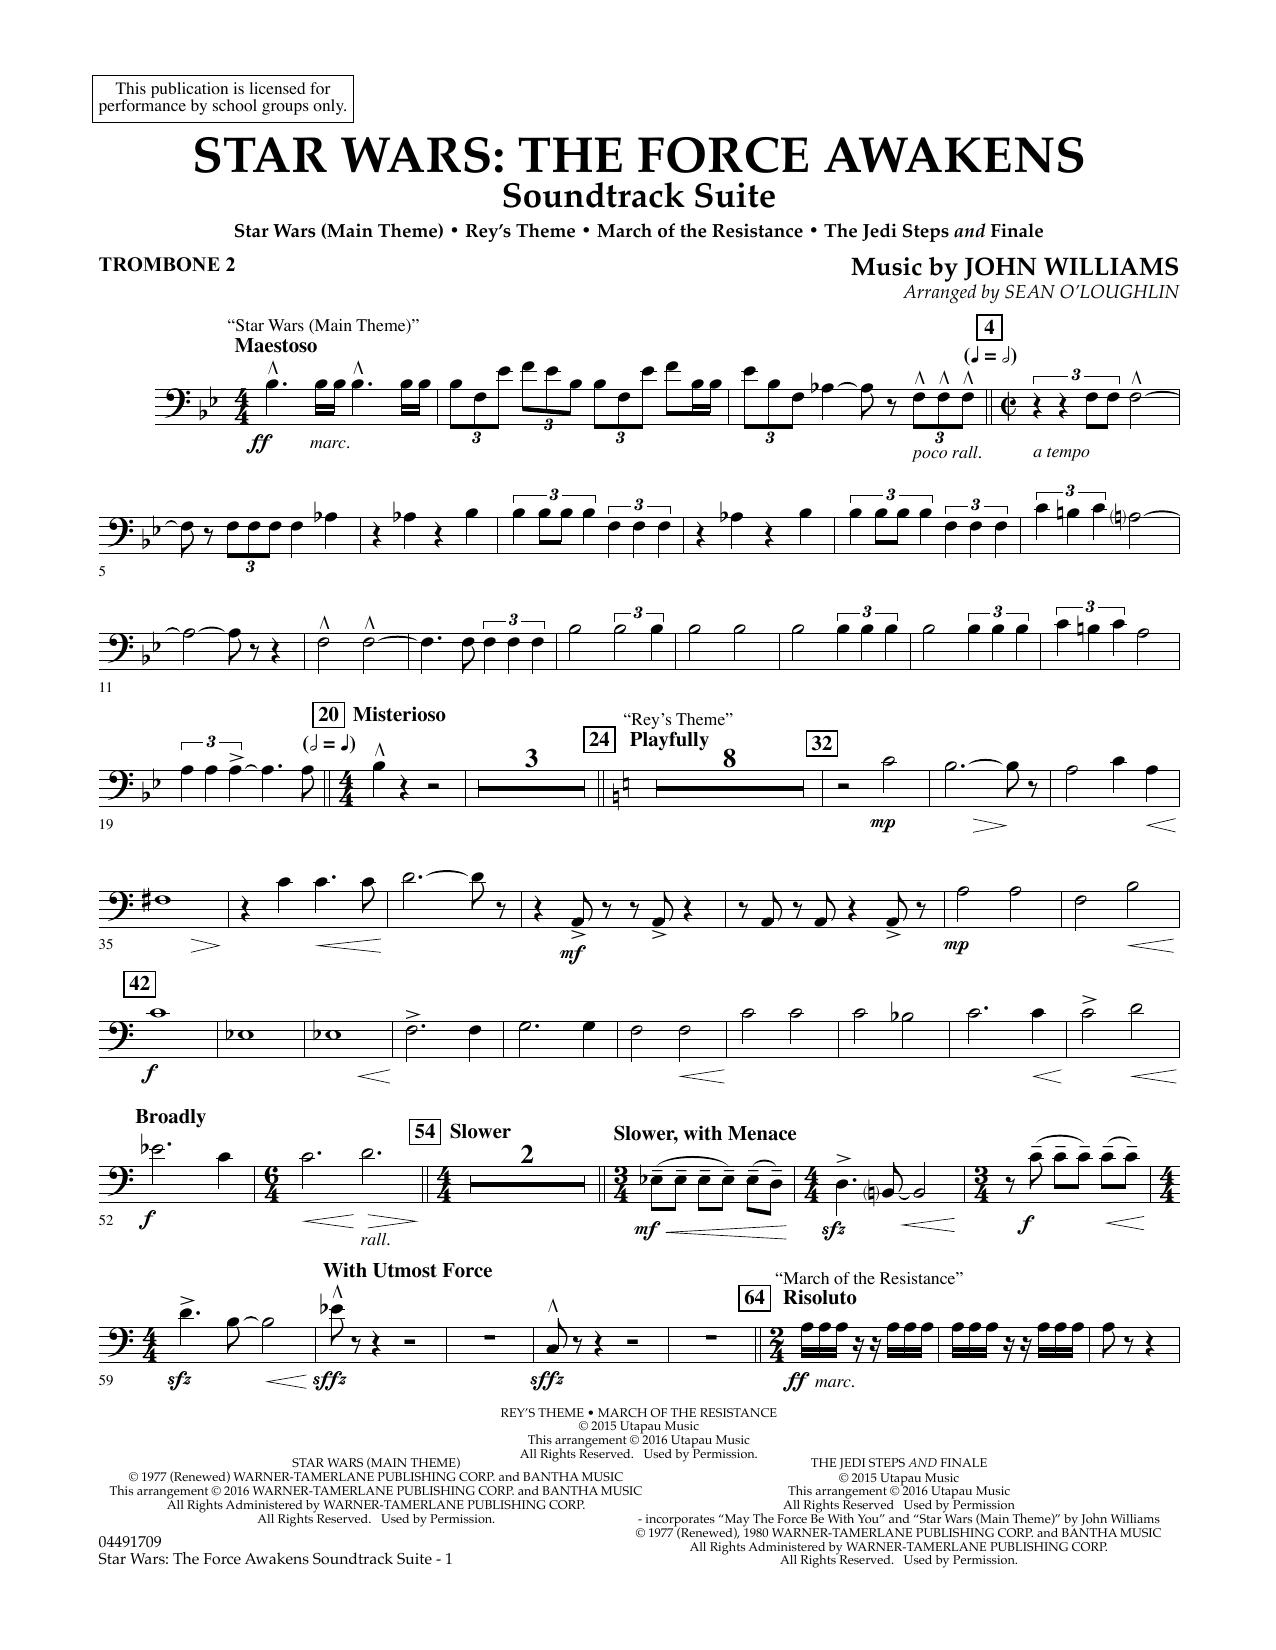 John Williams - Star Wars: The Force Awakens Soundtrack Suite - Trombone 2